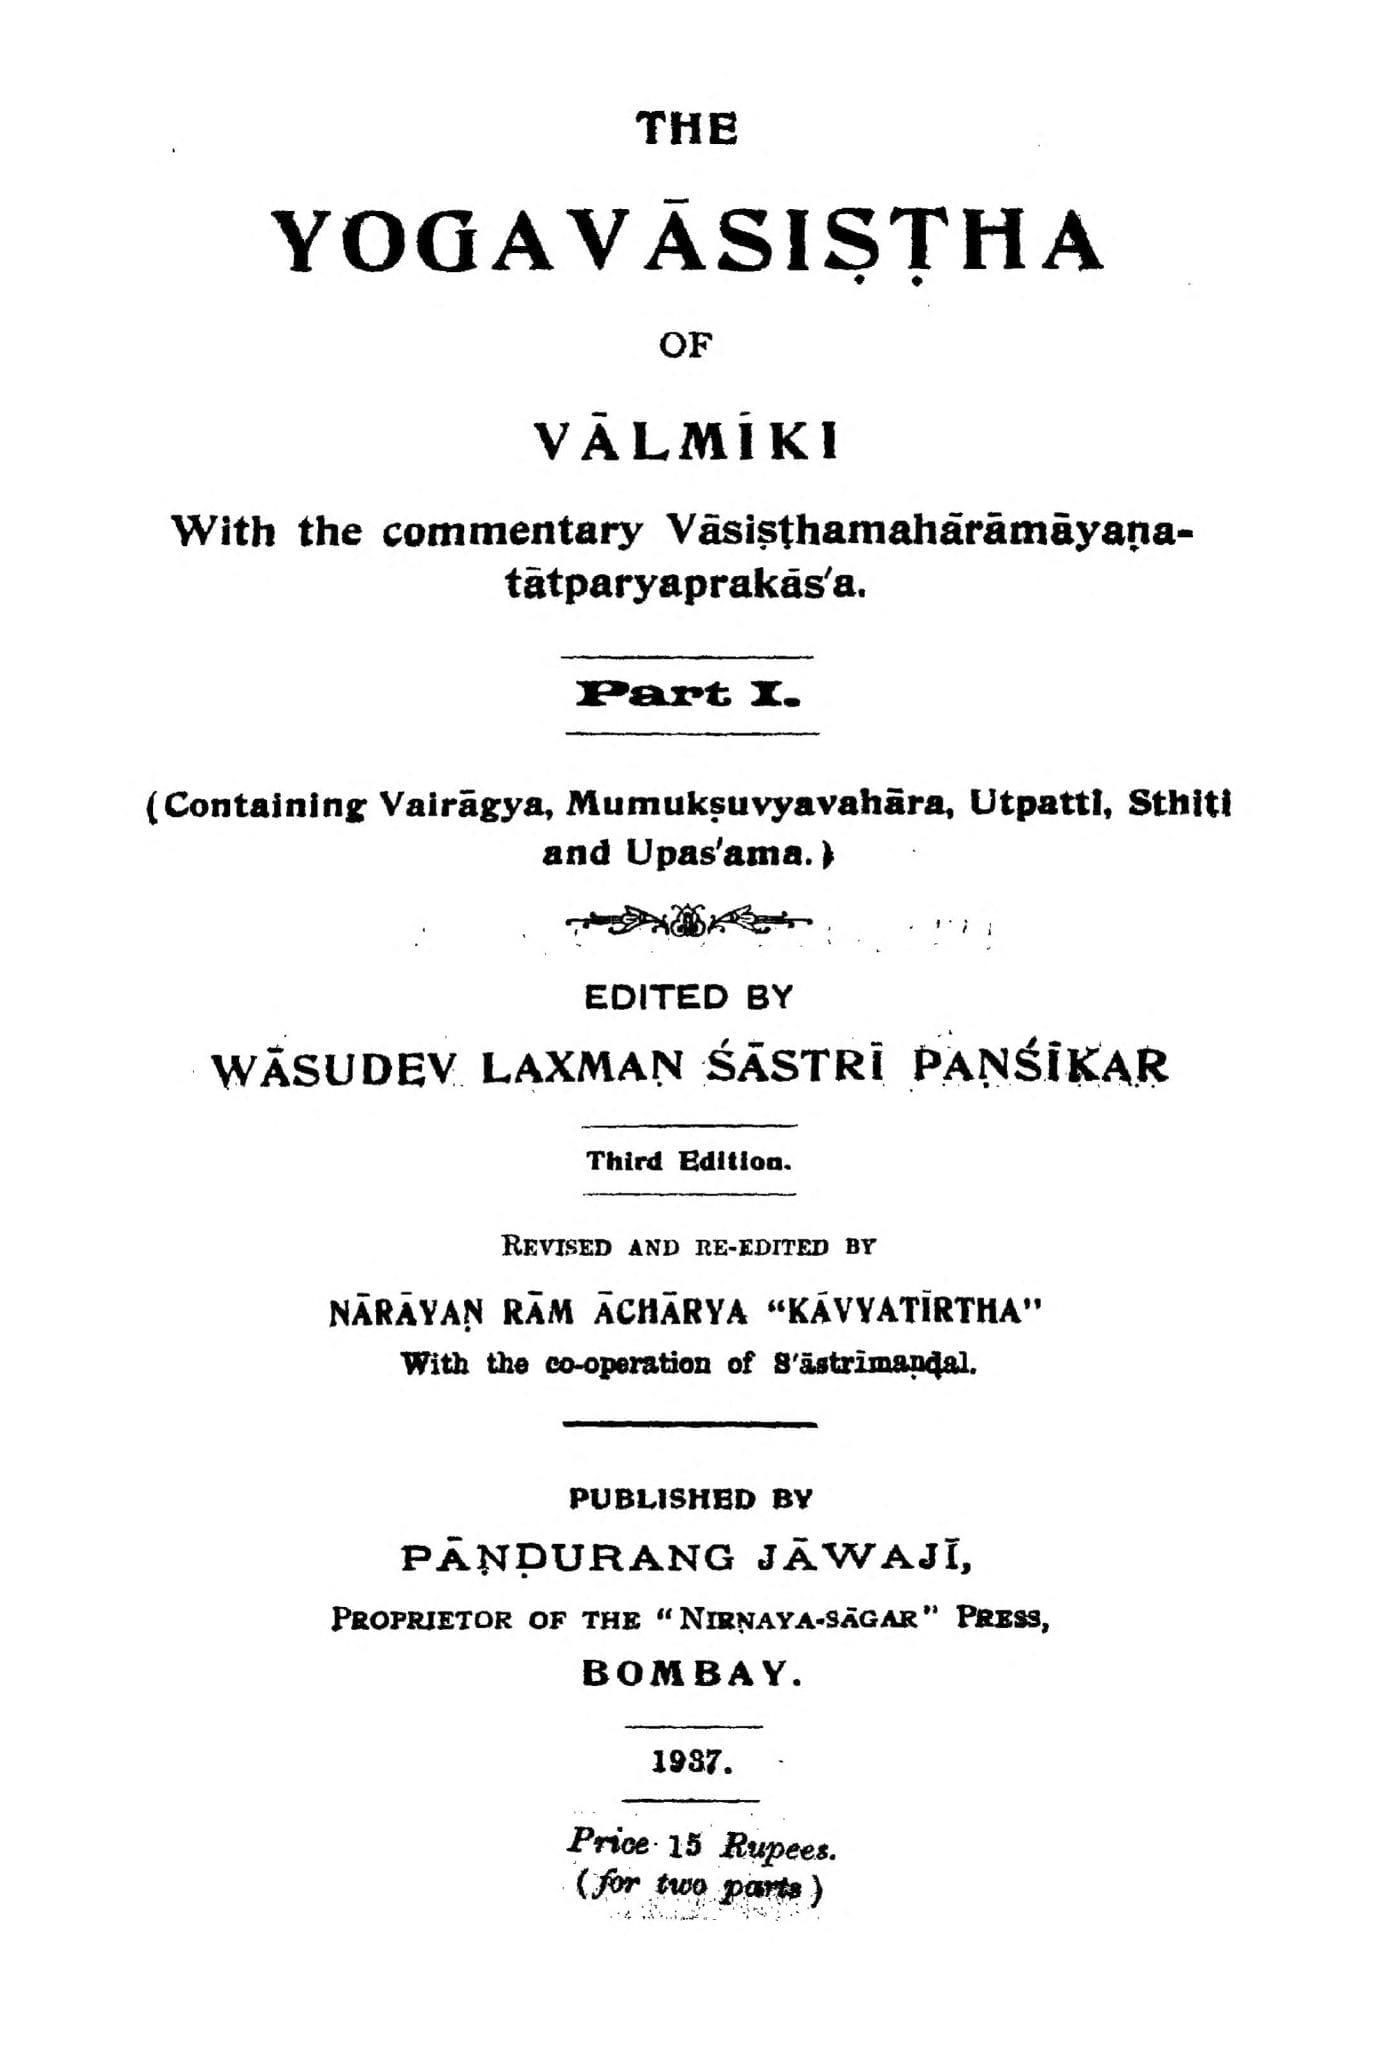 व ल म क क य ग वस स थ The Yoga Vasistha Of Valmiki व स द व लक स मन श स त र Wasudev Laxman Sastri Hindi Pdf Download Read Online Epustakalay